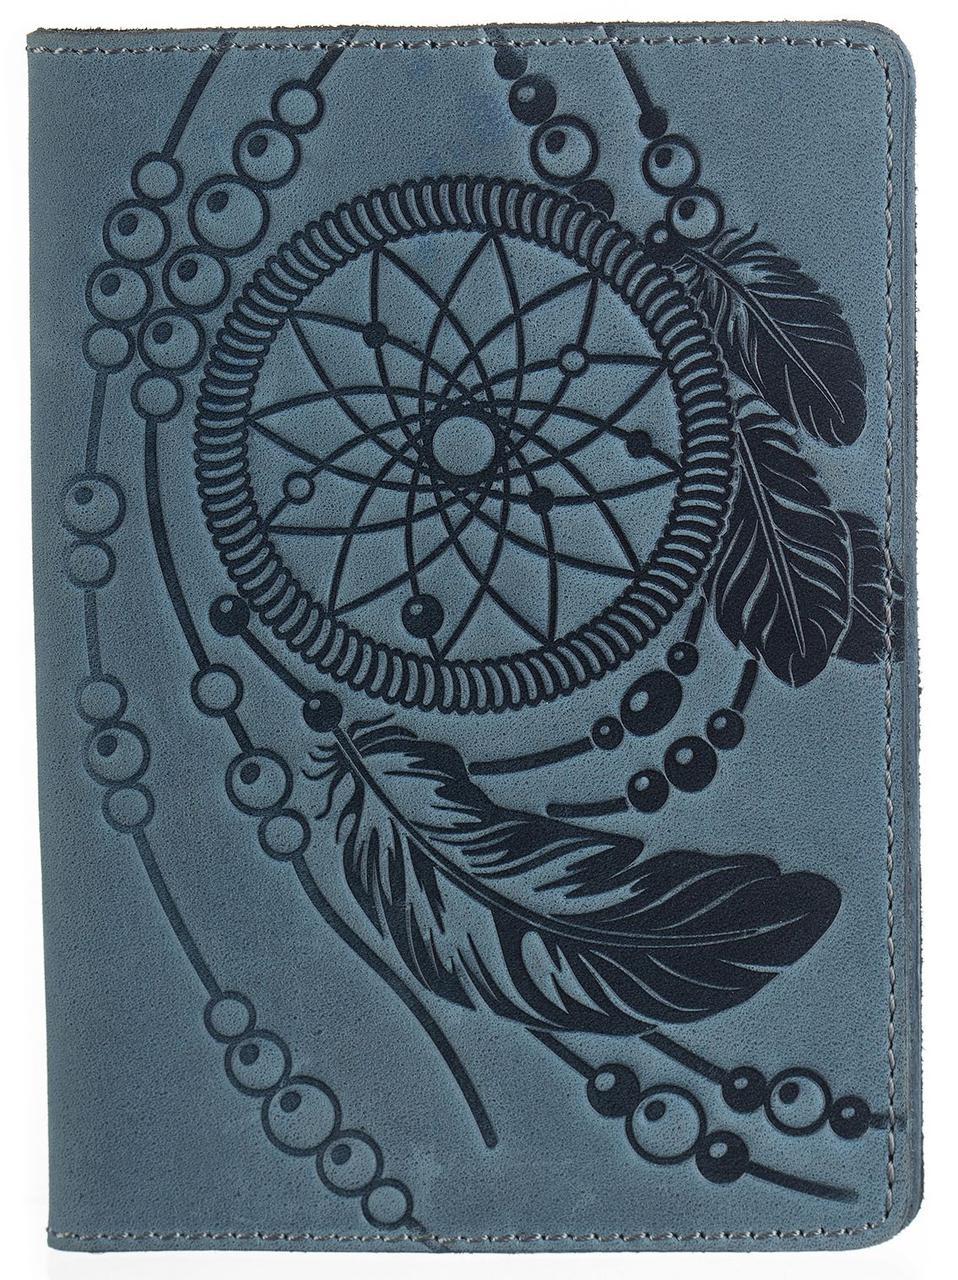 Обкладинка на паспорт SHVIGEL 13795 блакитна